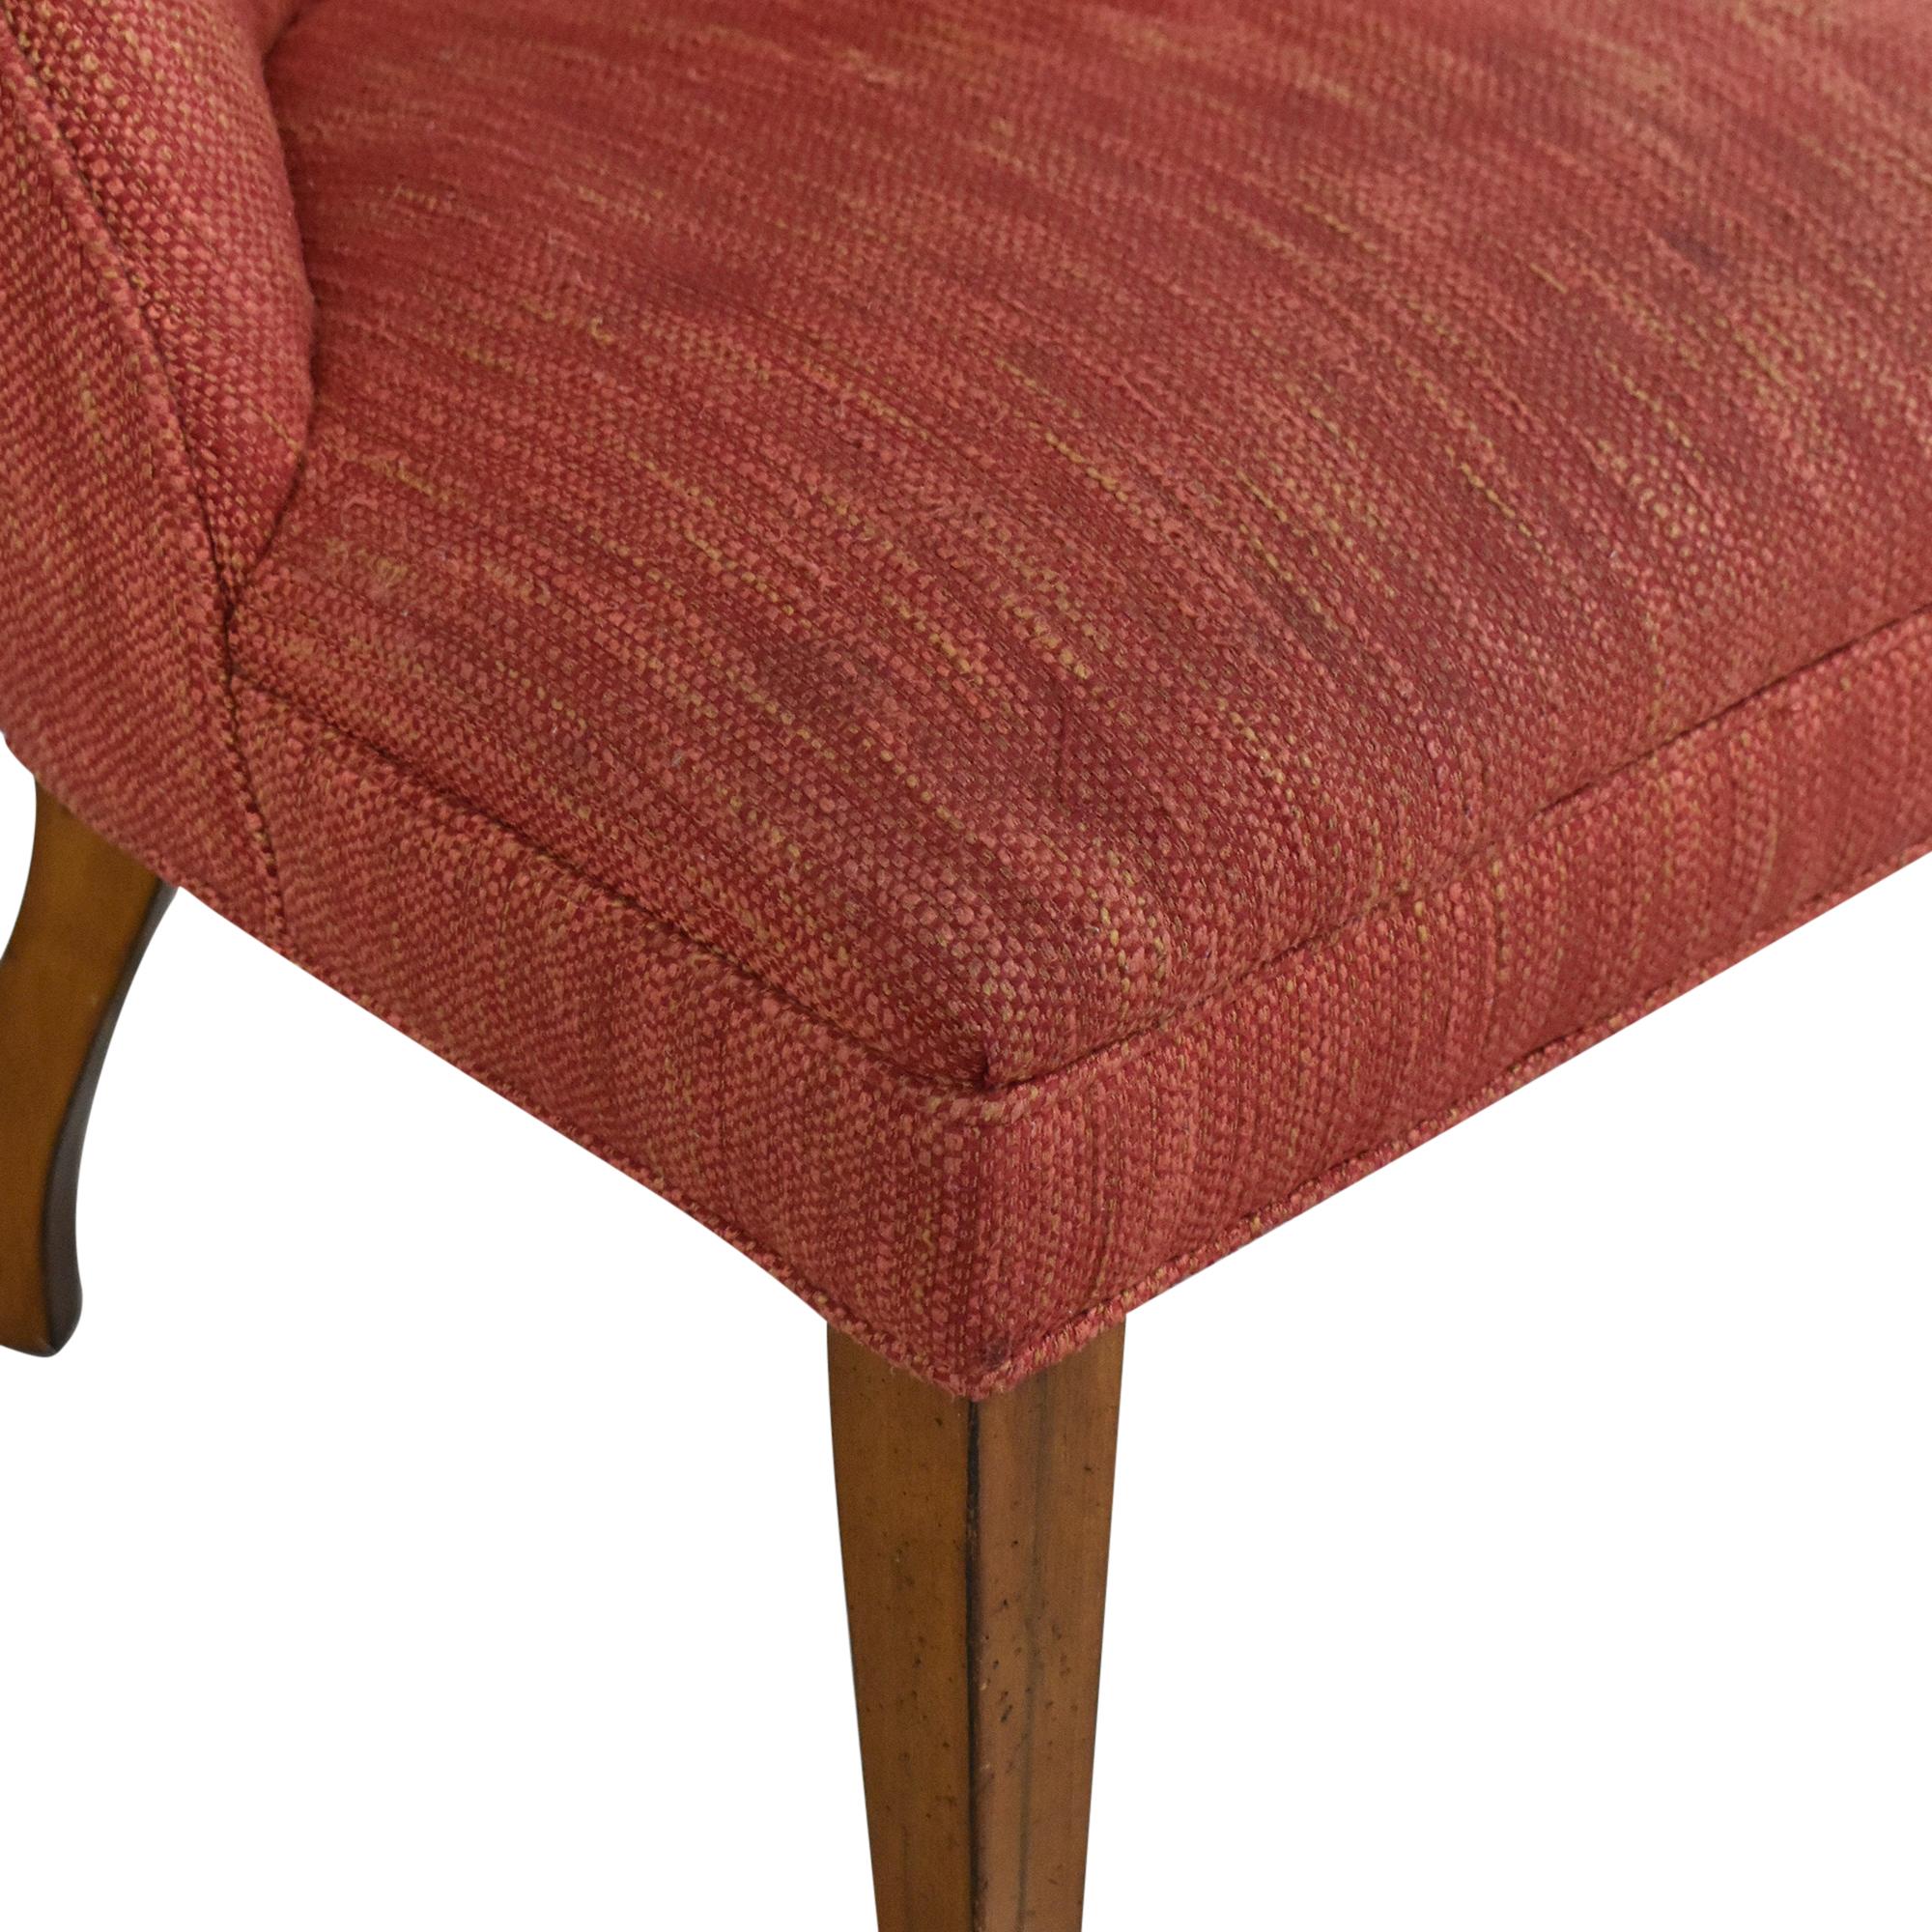 buy Liz Claiborne Tufted Accent Chair Liz Claiborne